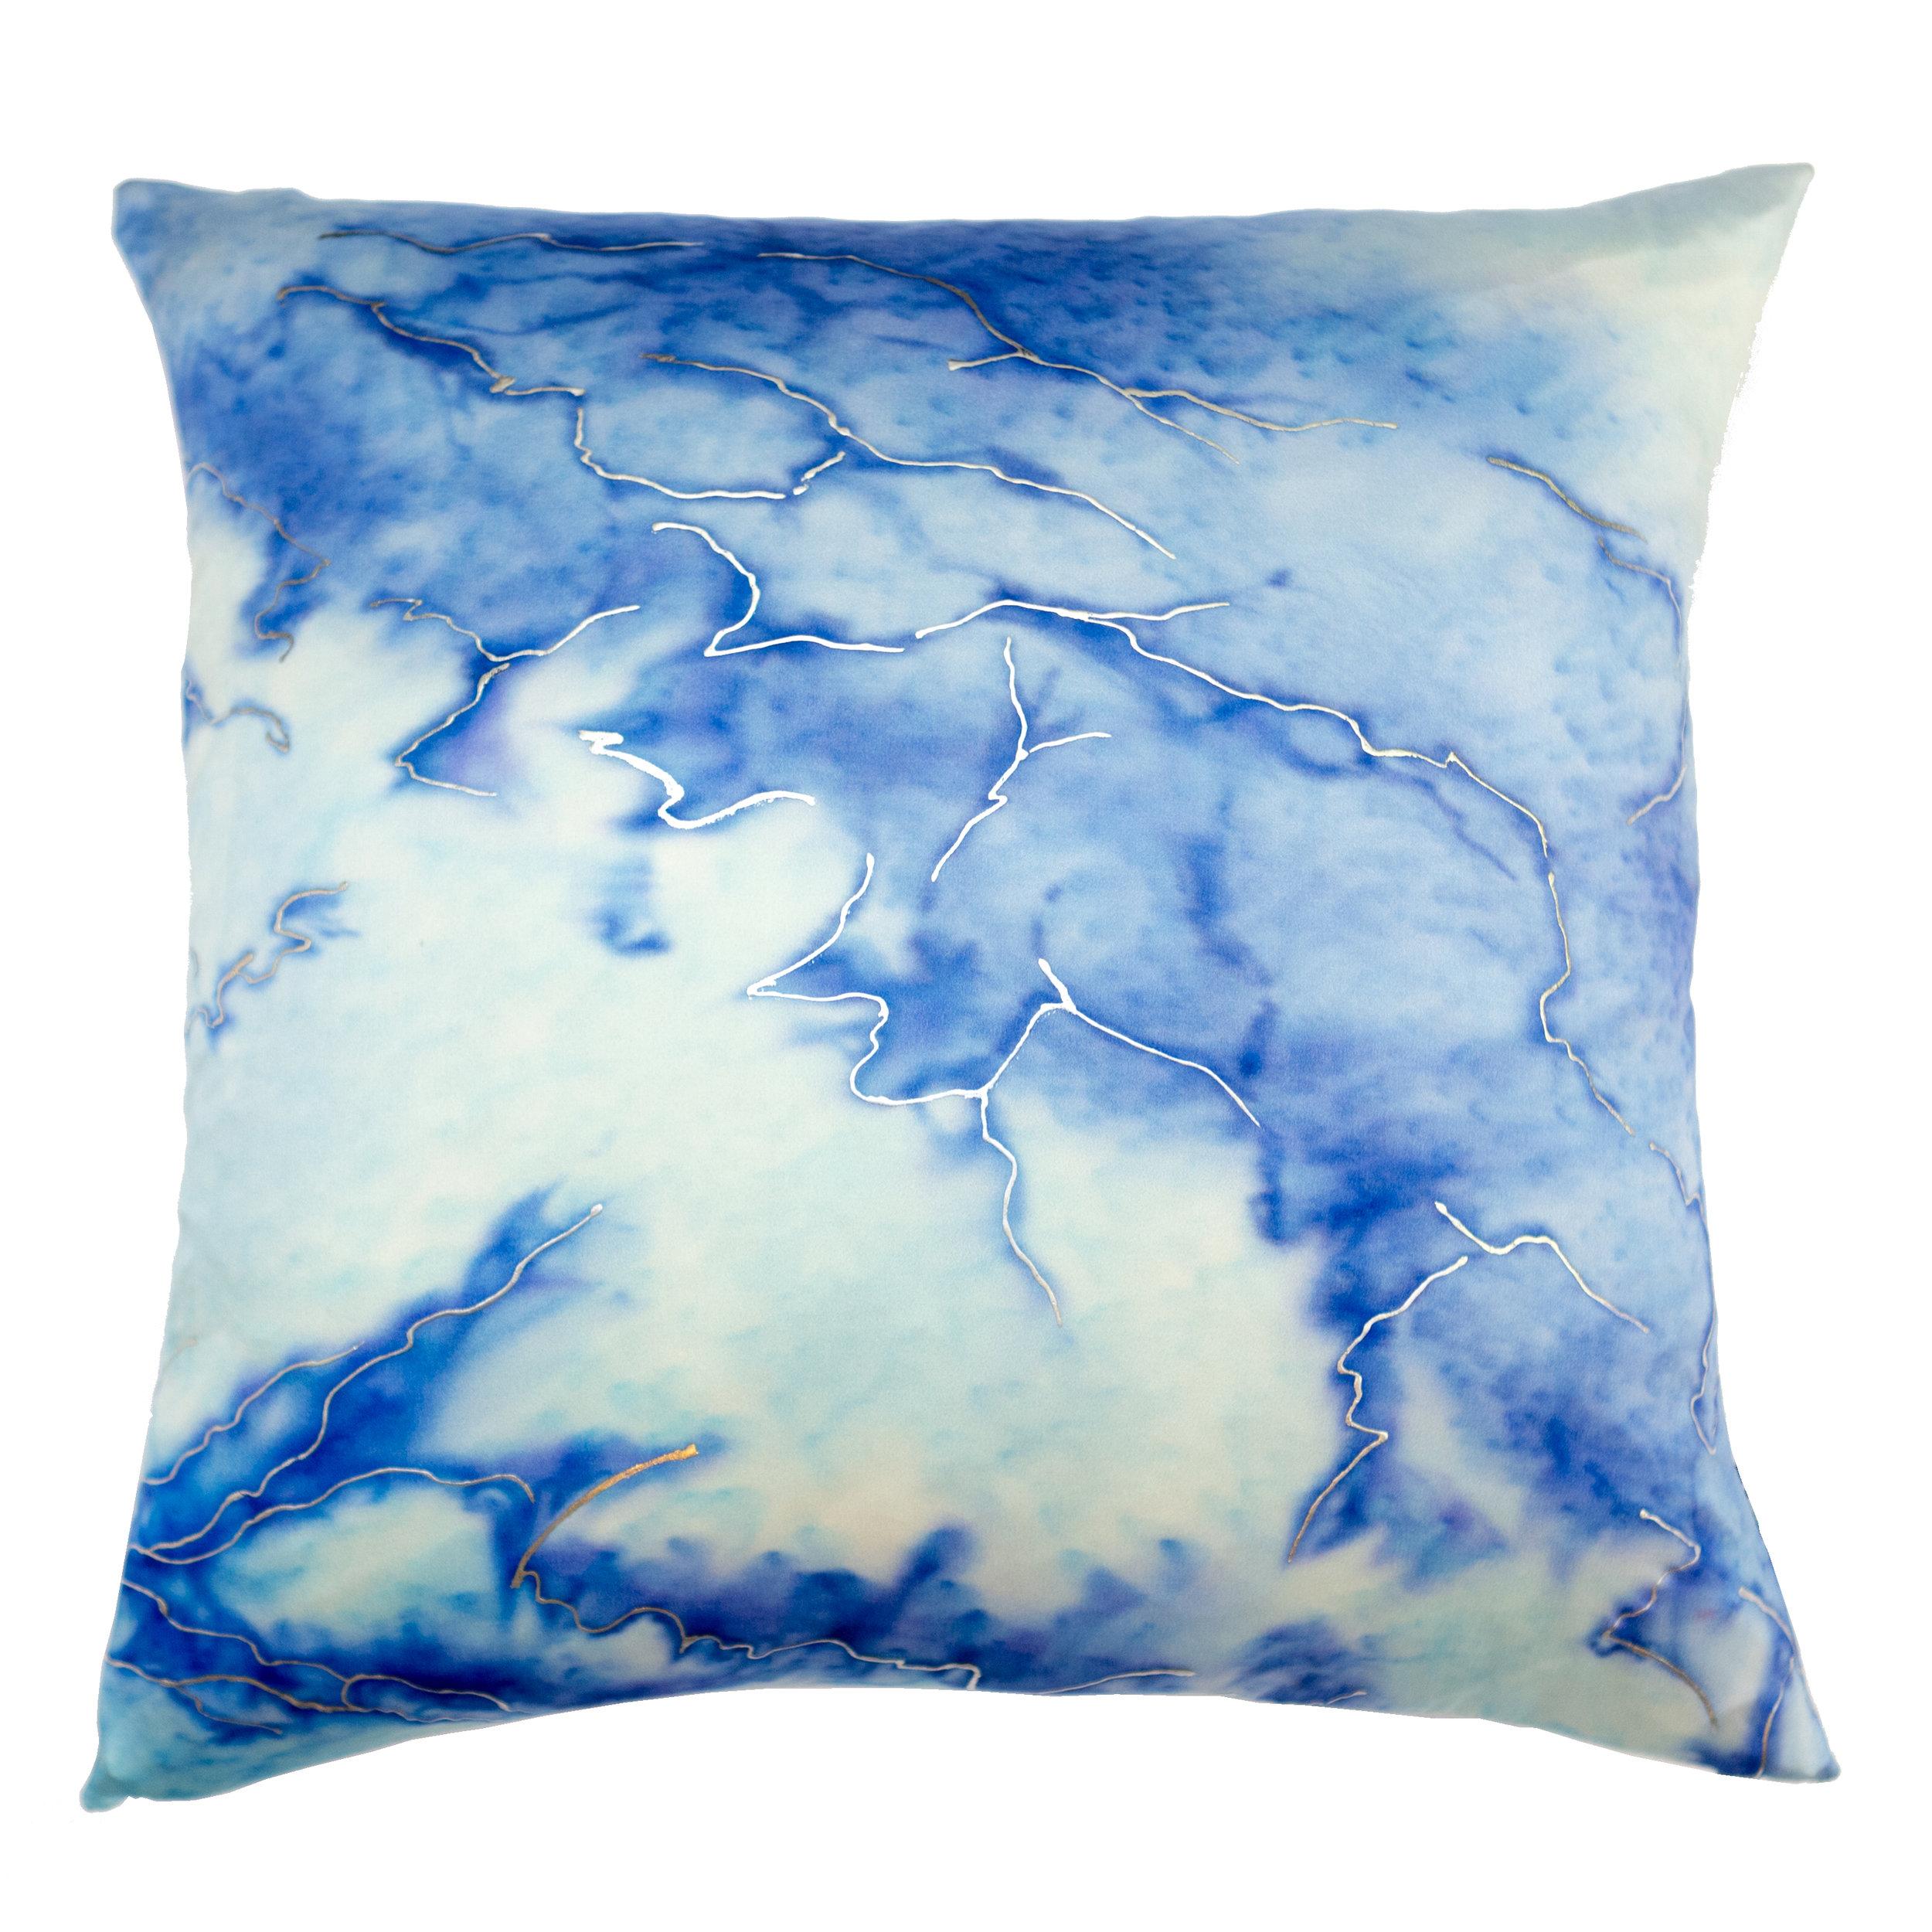 Marie-Burgos-Design.Glacier-2-Pillow.MBcollection.jpg